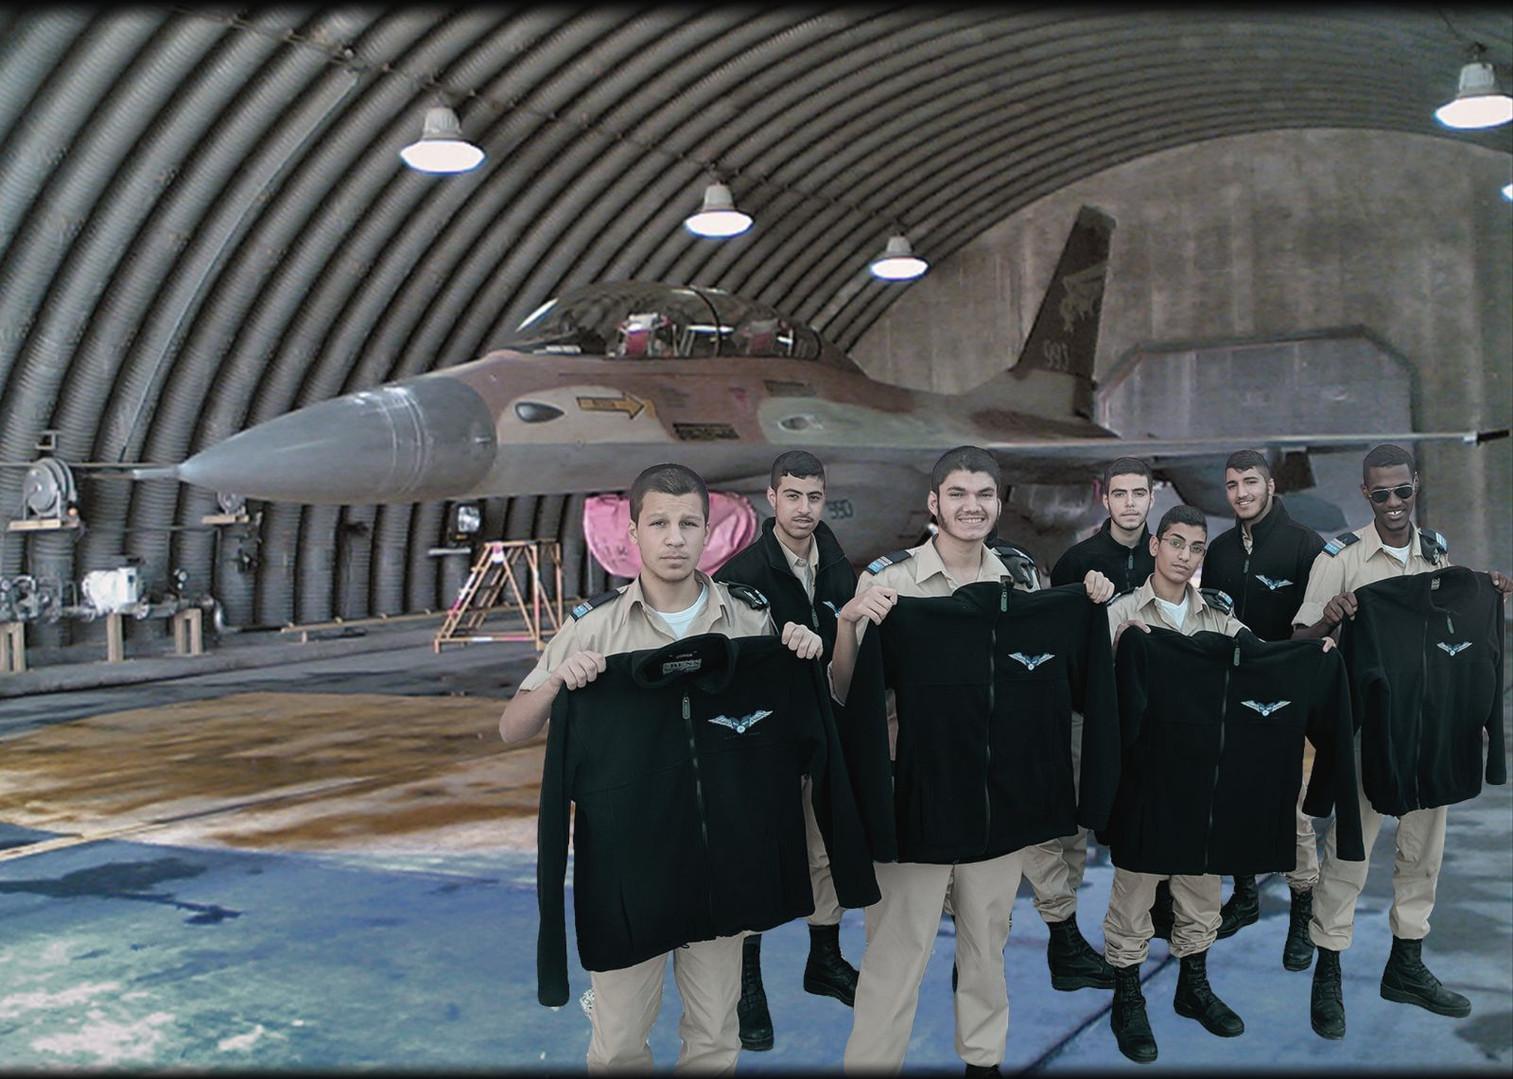 IAF soldiers.jpeg